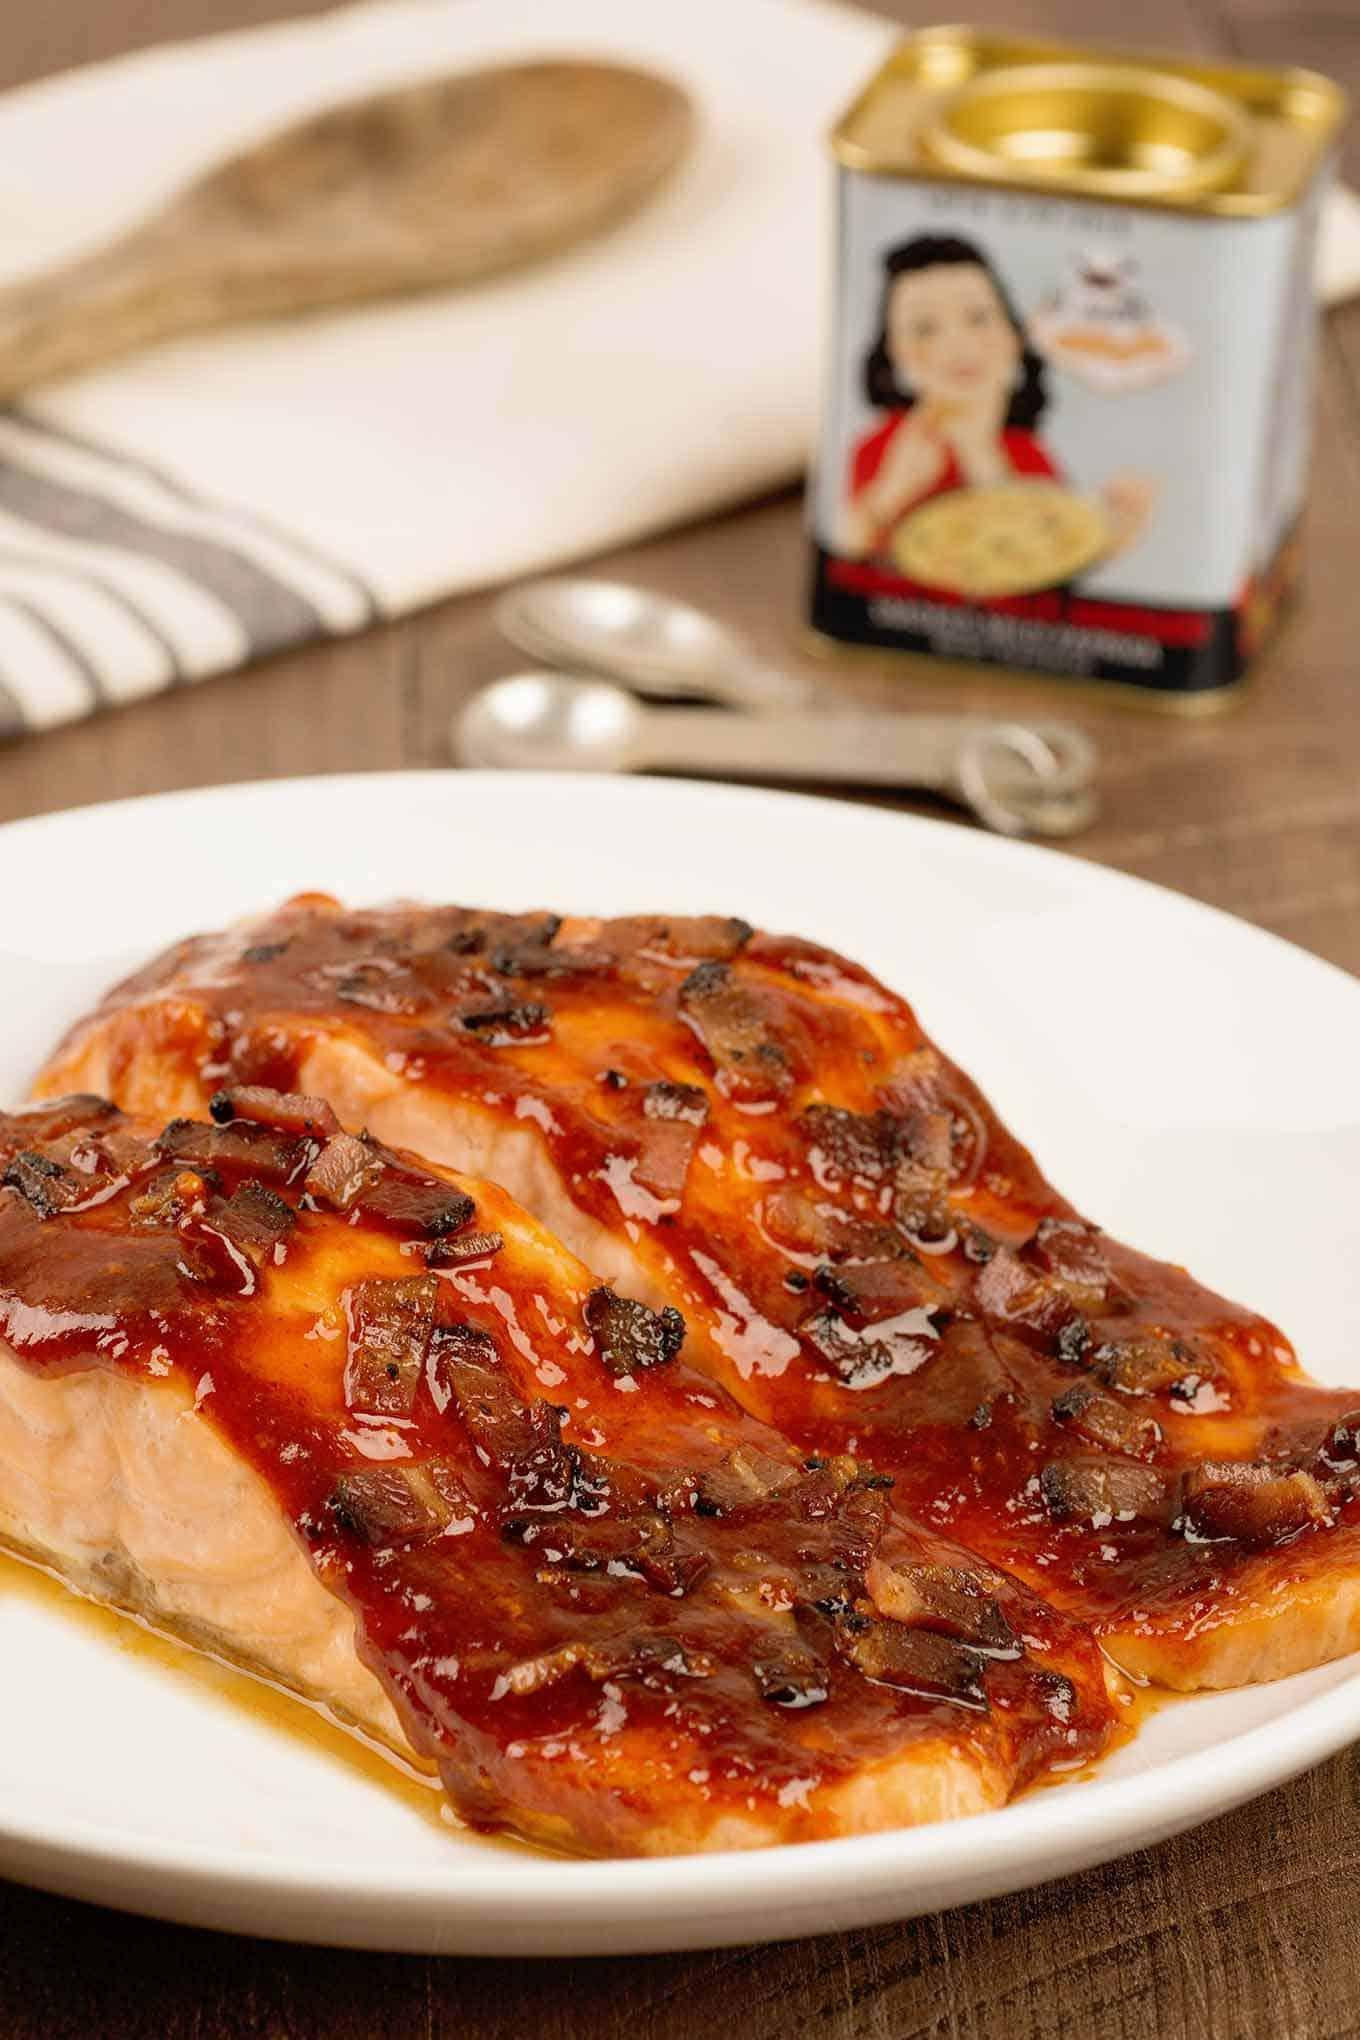 Smoky bacon glazed salmon on serving plate